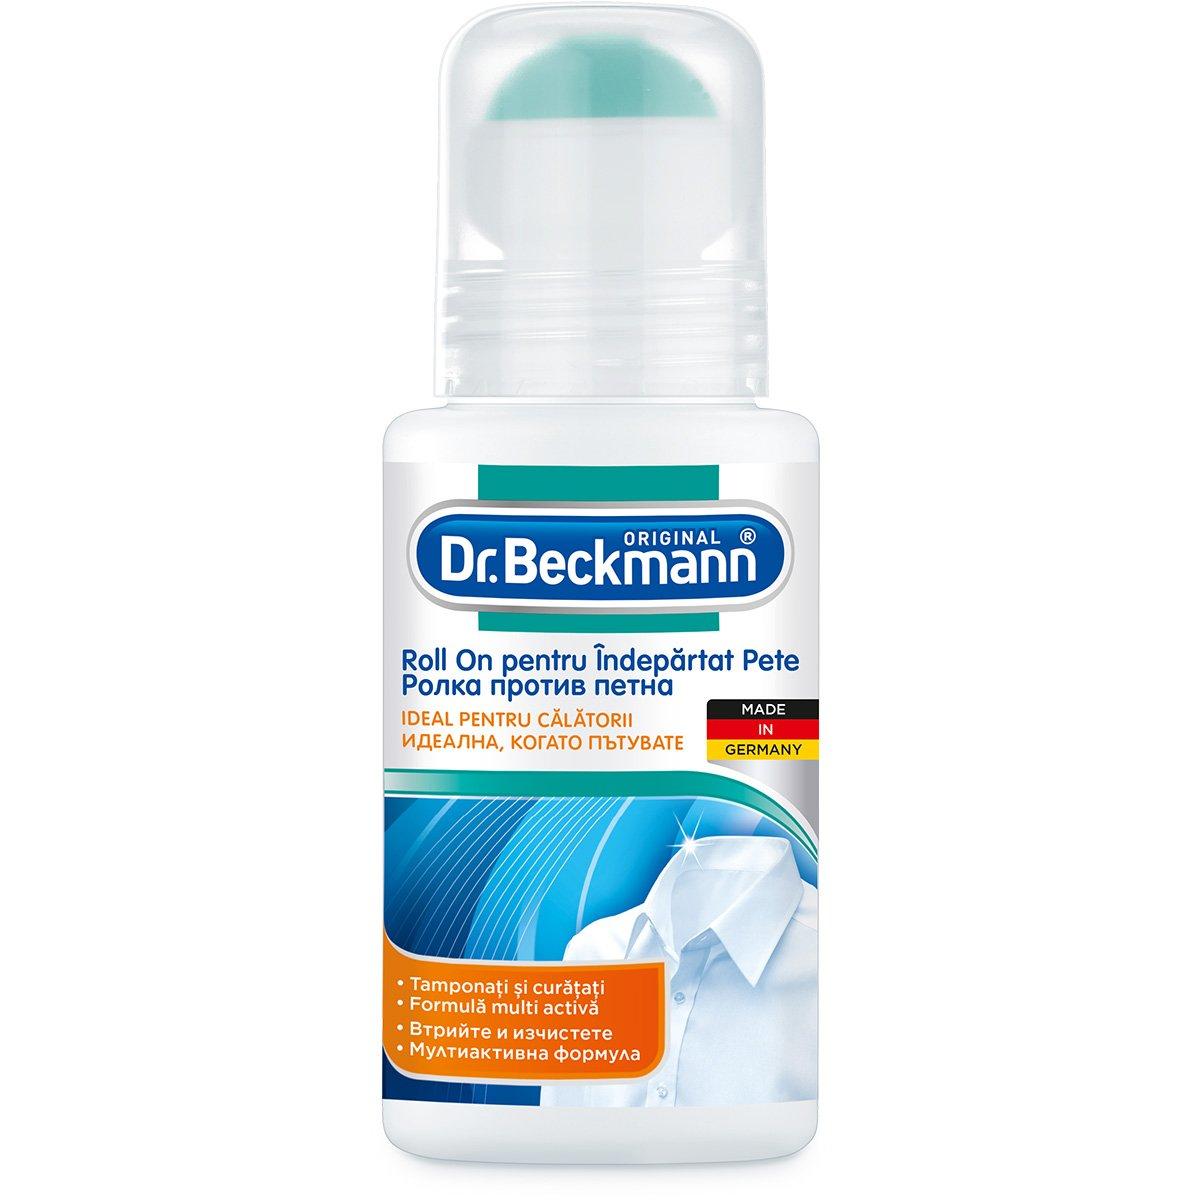 Roll on pentru indepartarea petelor Dr. Beckmann, 75 ml imagine